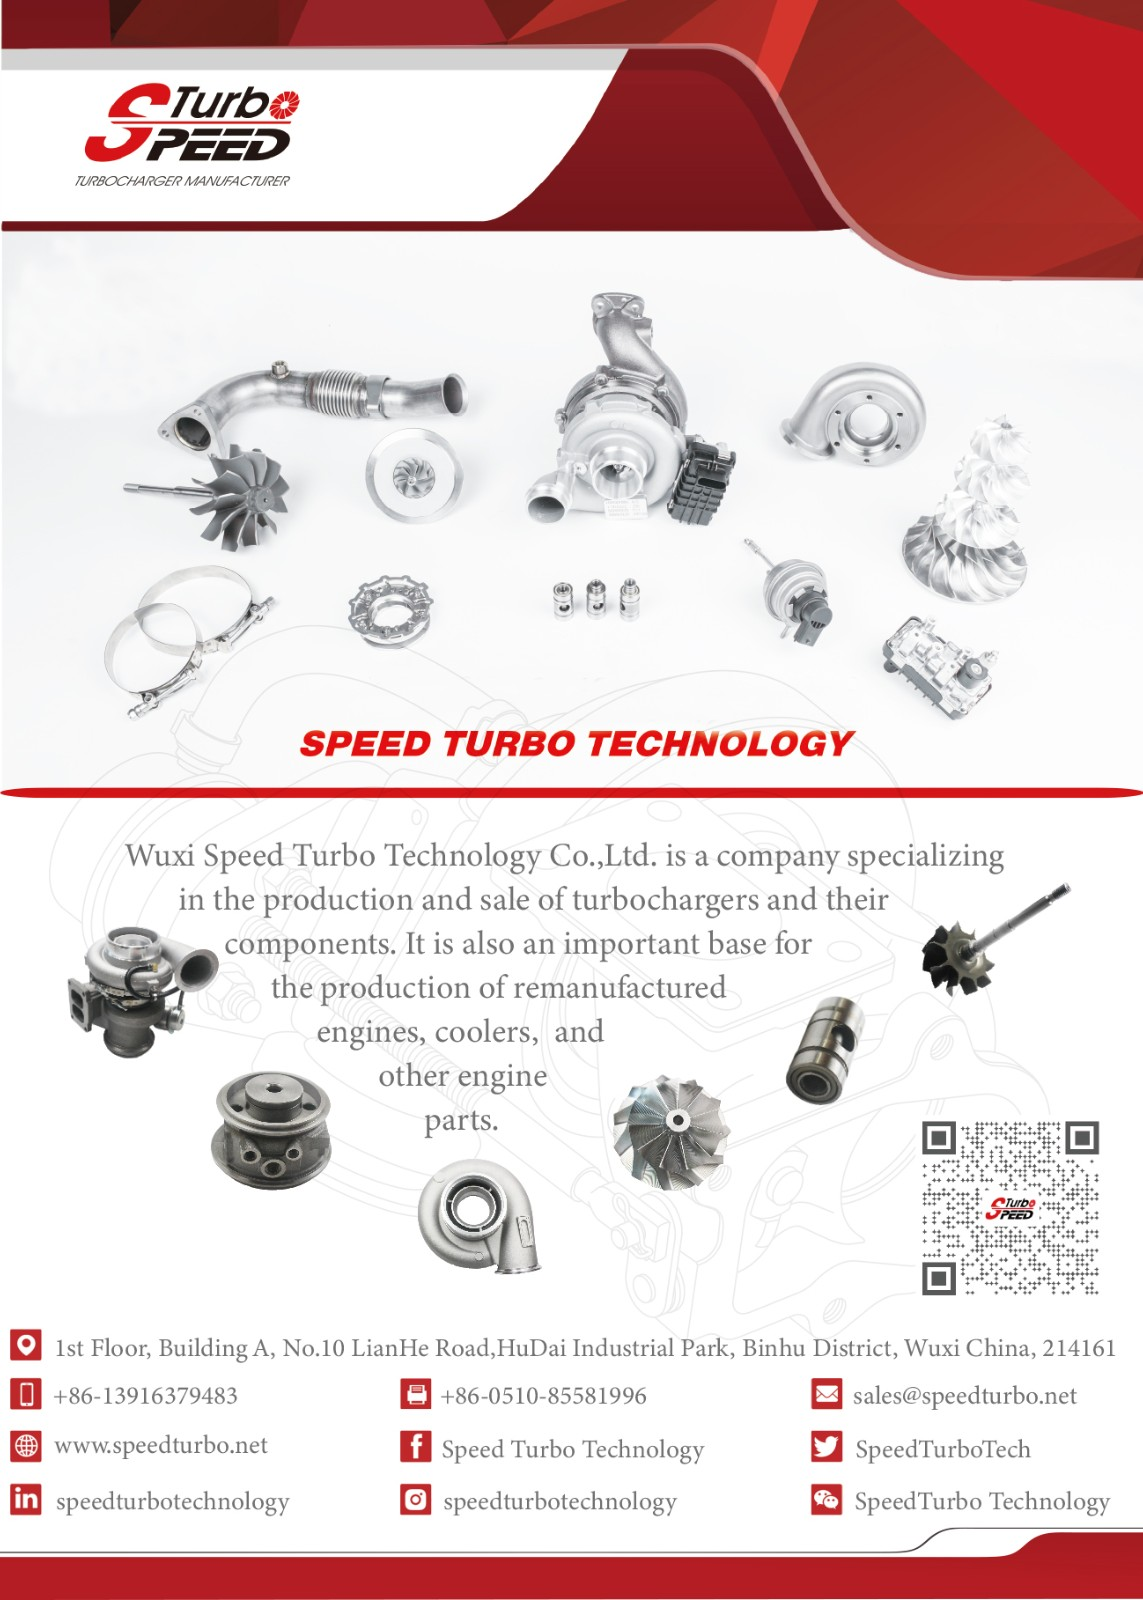 WUXI SPEED TURBO TECHNOLOGY CO., LTD